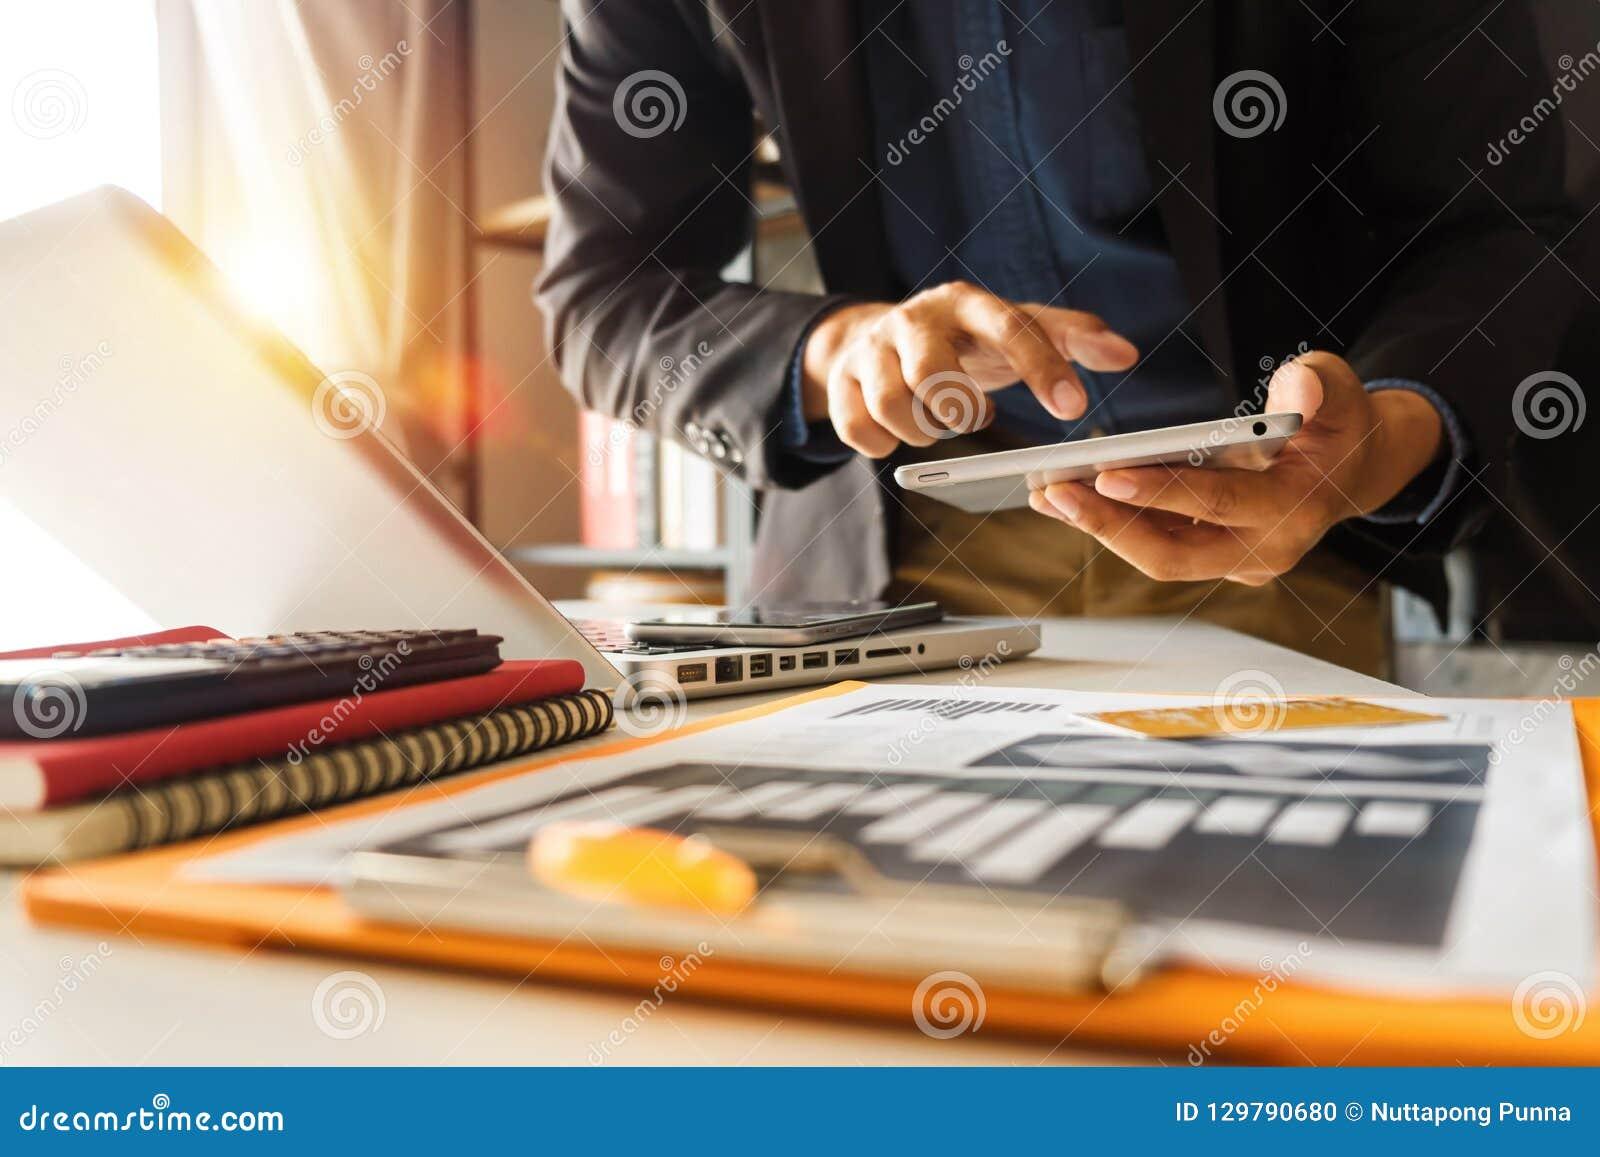 Zaken met sociaal netwerkdiagram met digitale tabletcomputer